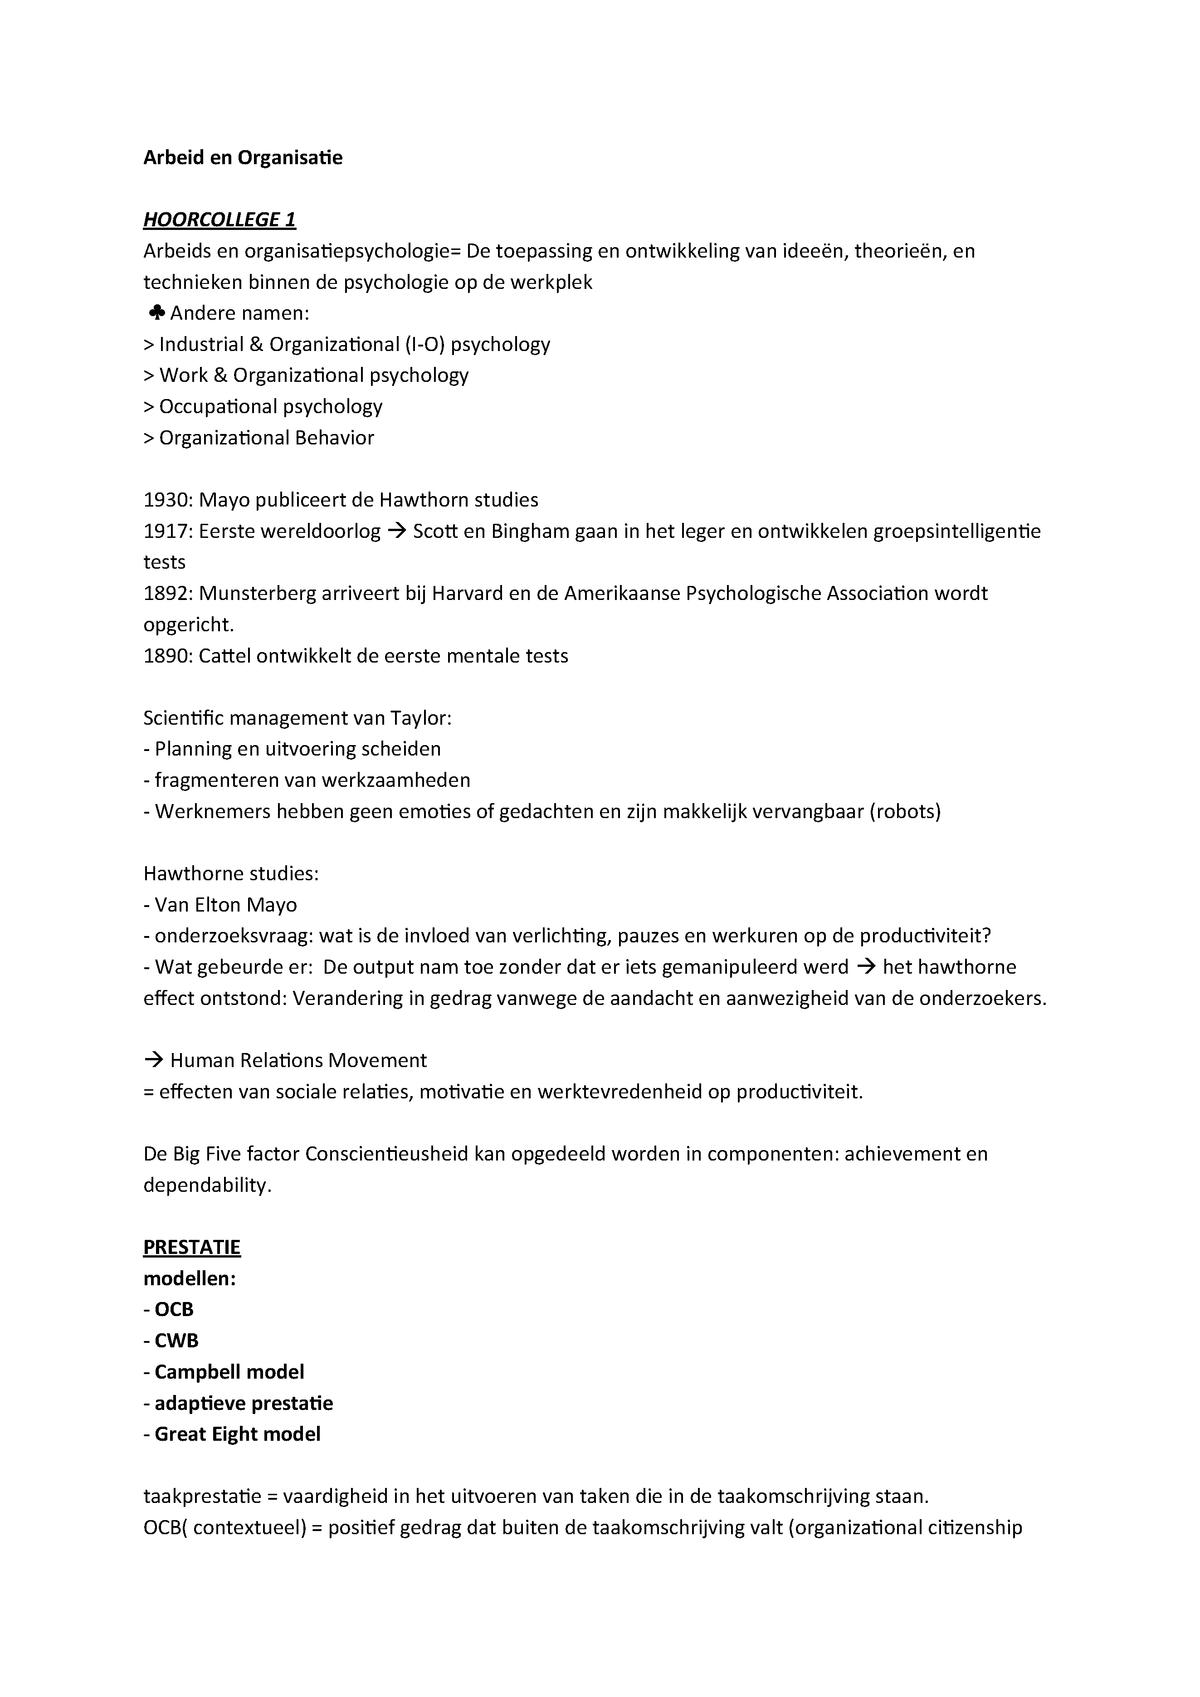 Speed Dating facilitatie techniek